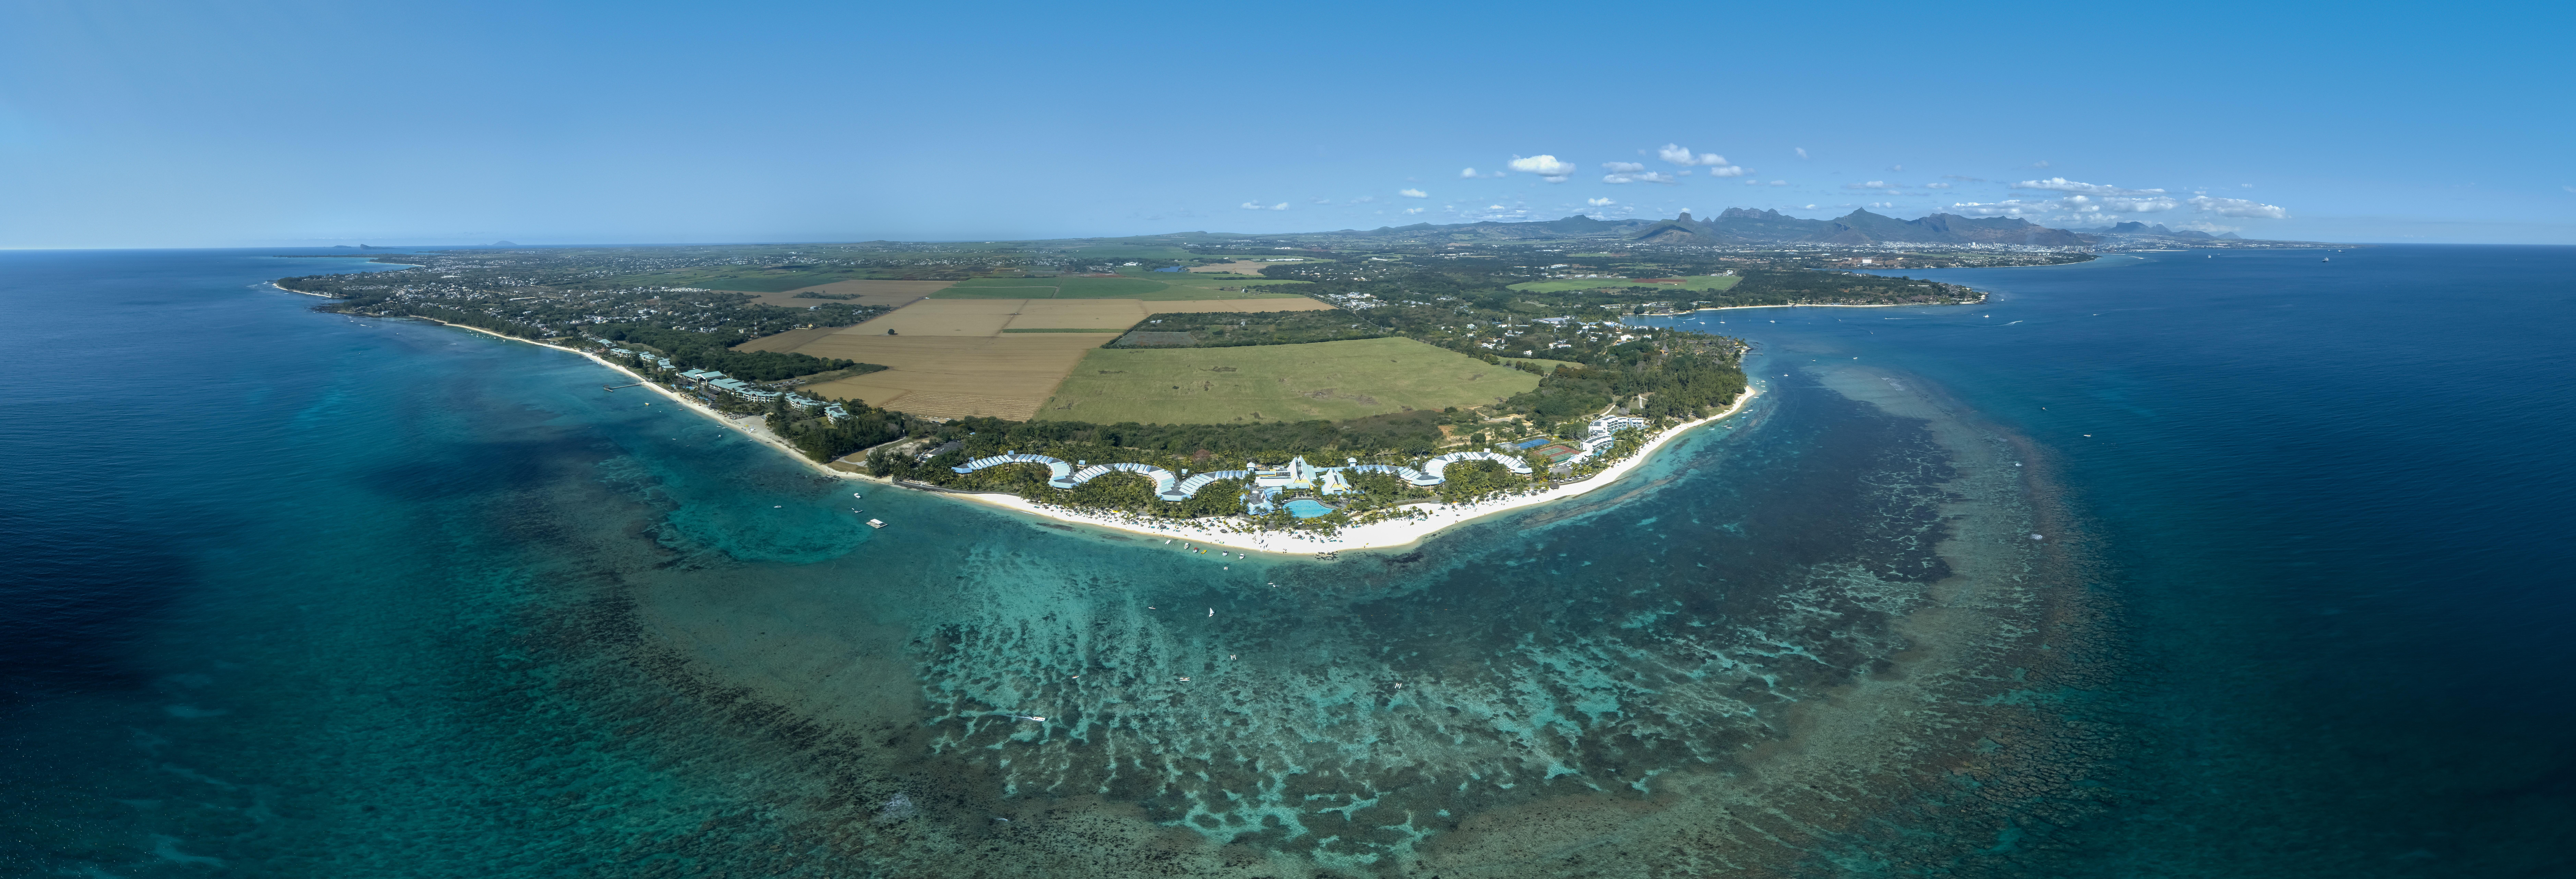 victoria-beach-resort-mauritius